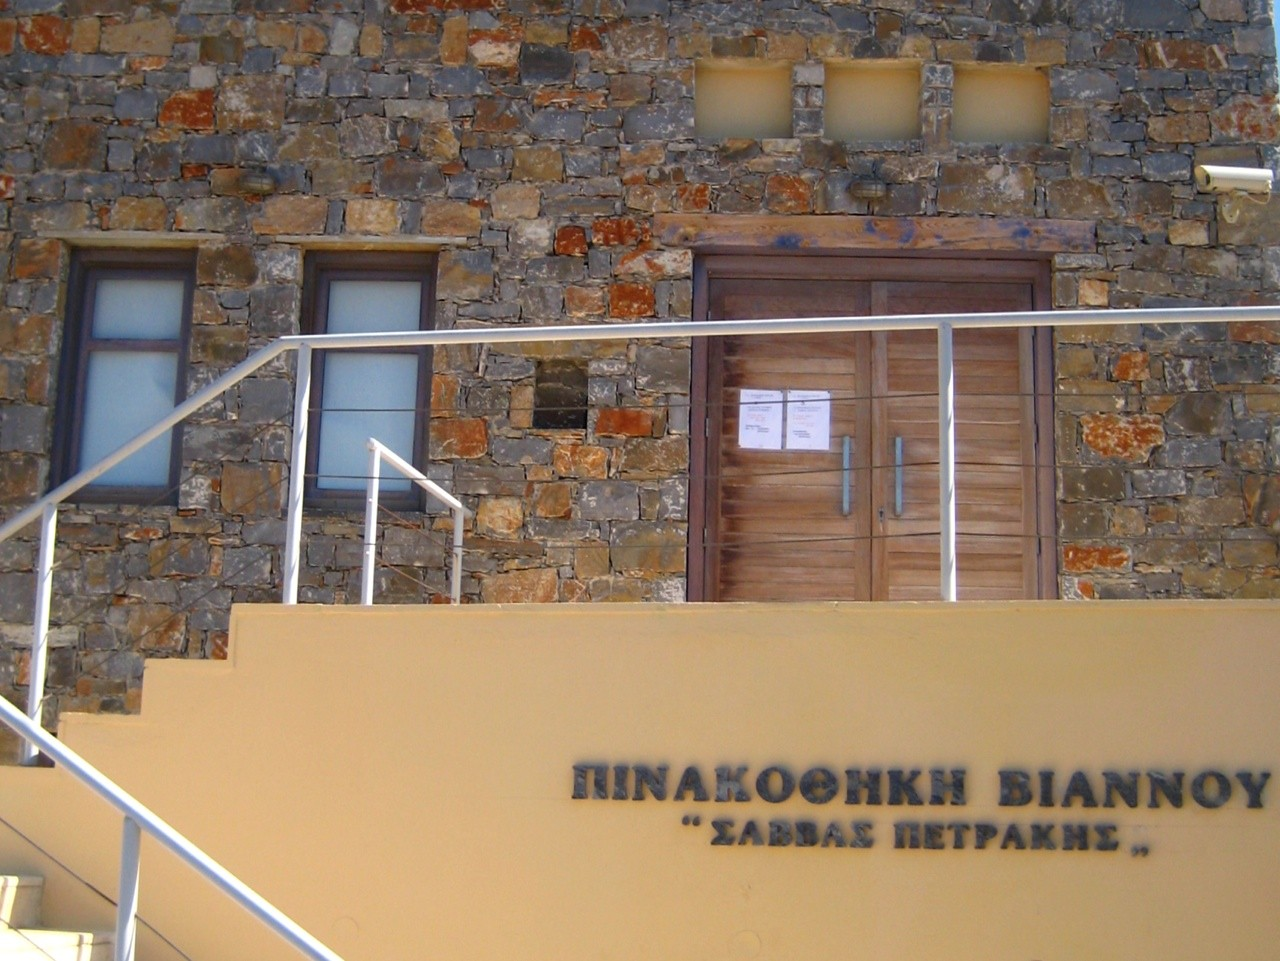 art gallery savvas petrakis viannos crete, viannos gallery savas petrakis, art in south heraklion crete, art gallery vianos crete, modern Art Gallery in Crete